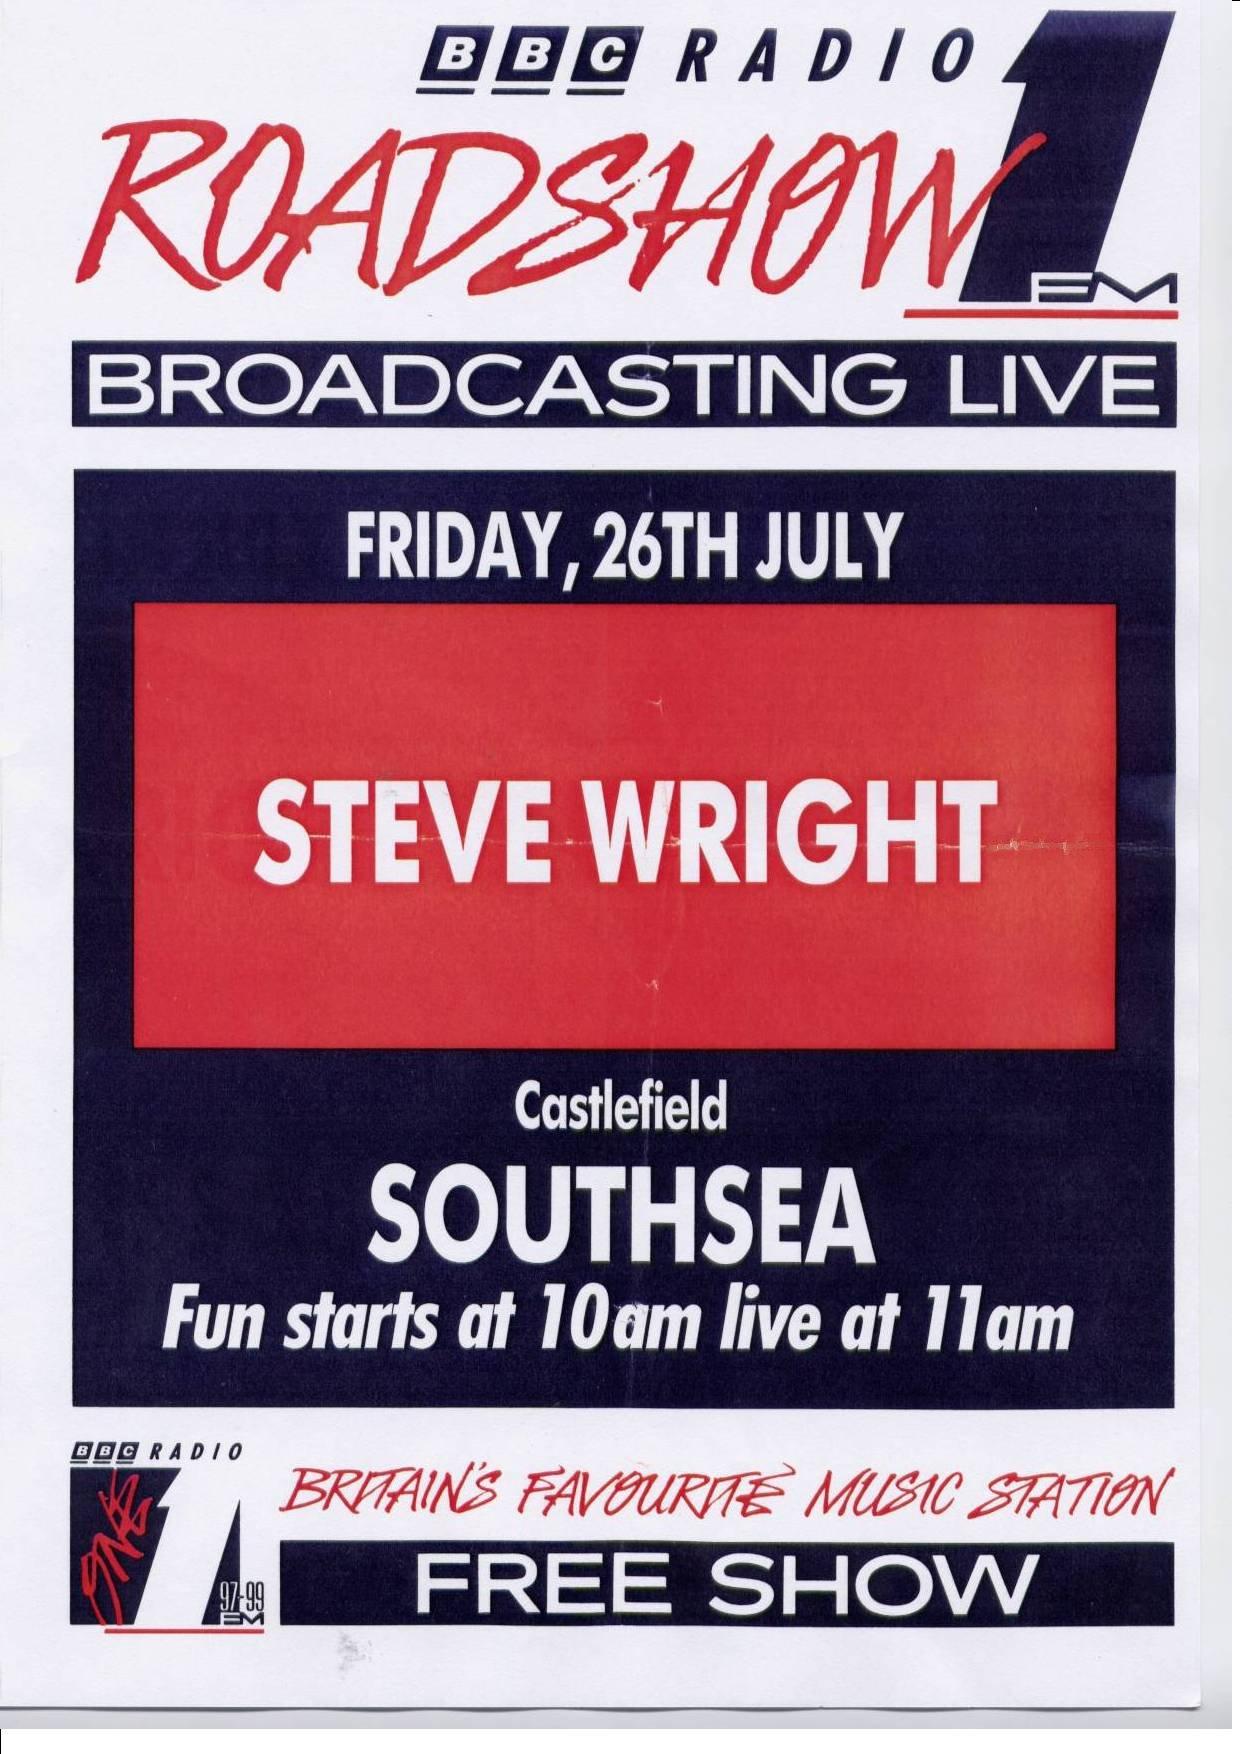 Radio Rewind - Radio 1 Shows - Roadshow; the later years